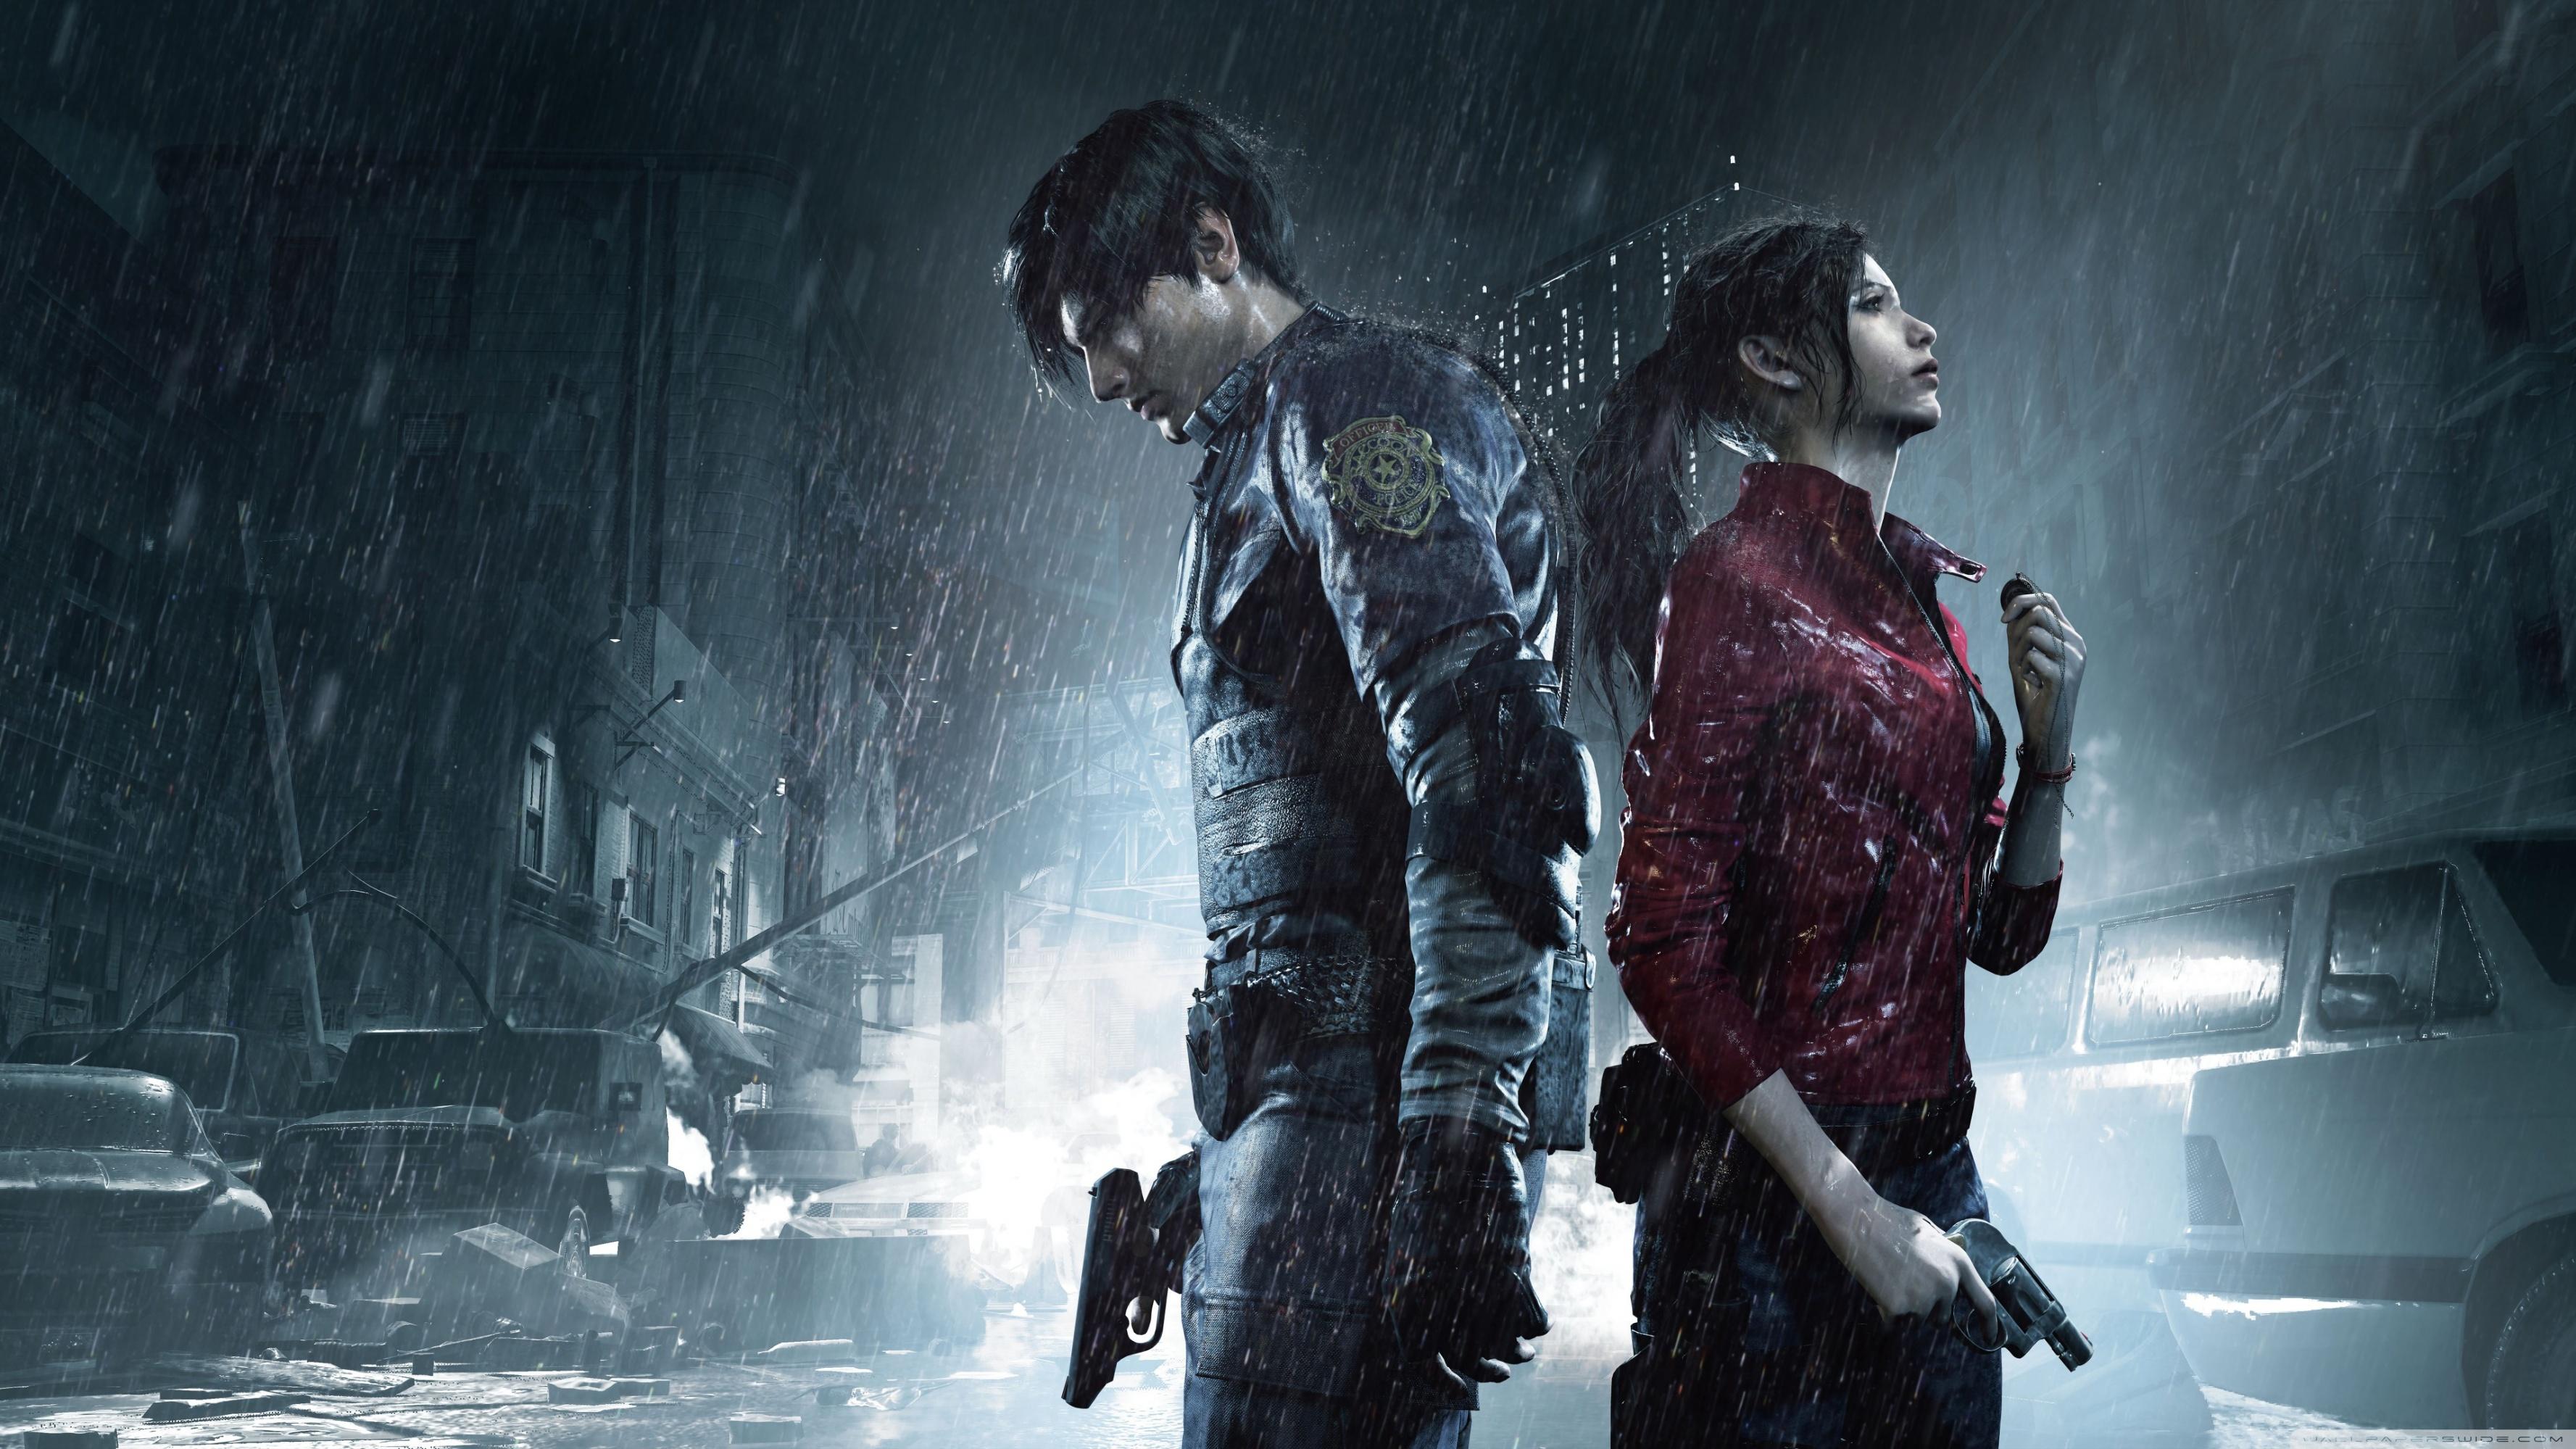 Resident Evil 3 Remake Desktop Wallpapers - Wallpaper Cave